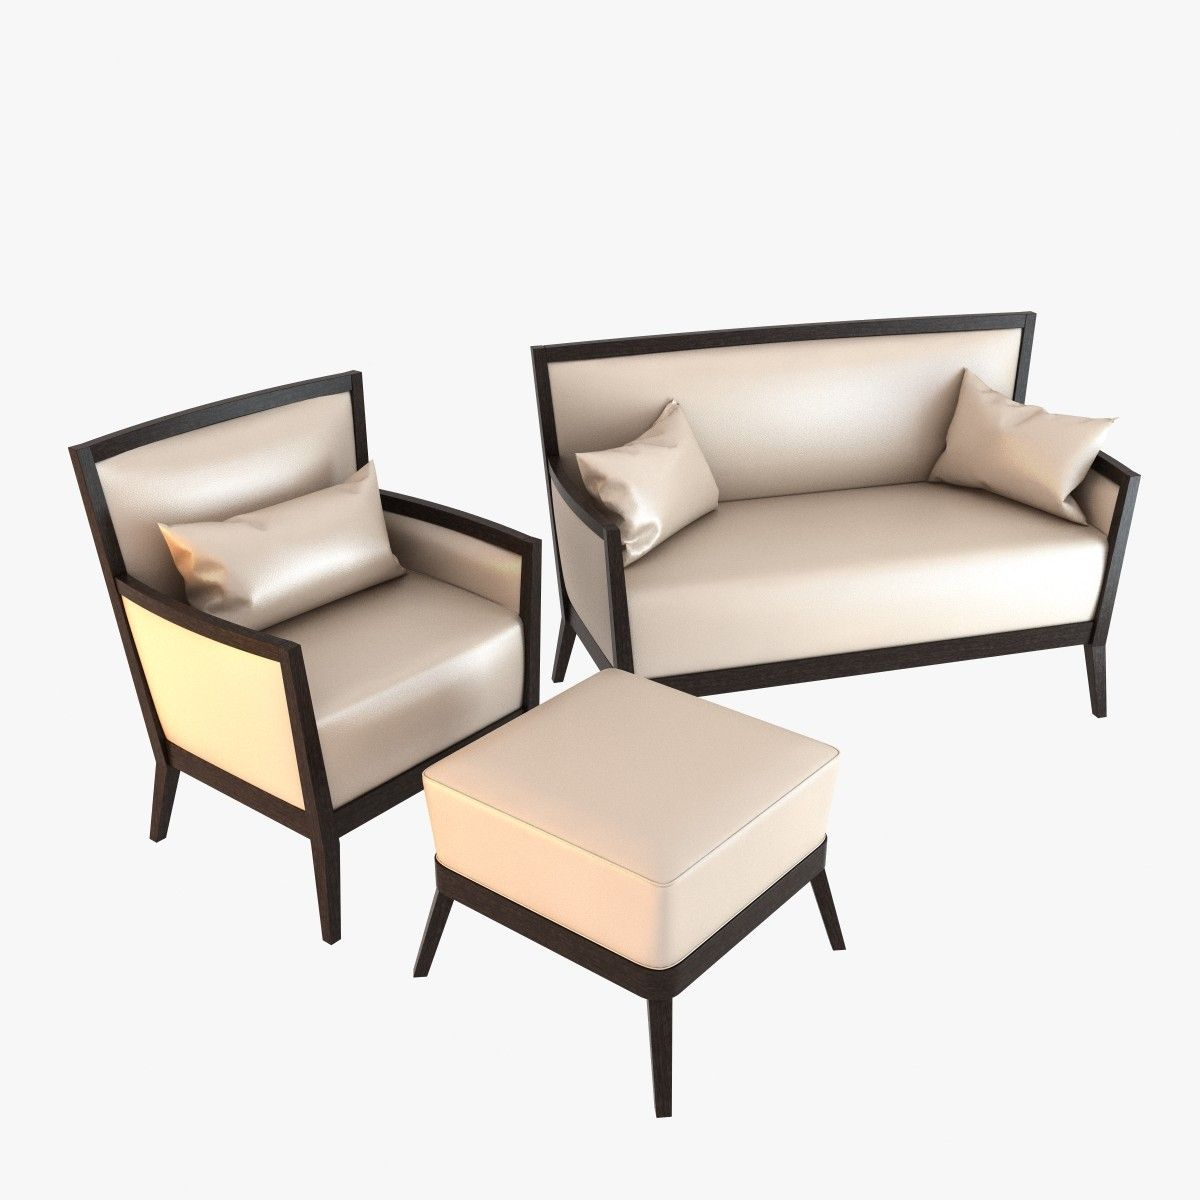 Sofa Sedie Armchair 3D Model 3D Model (con